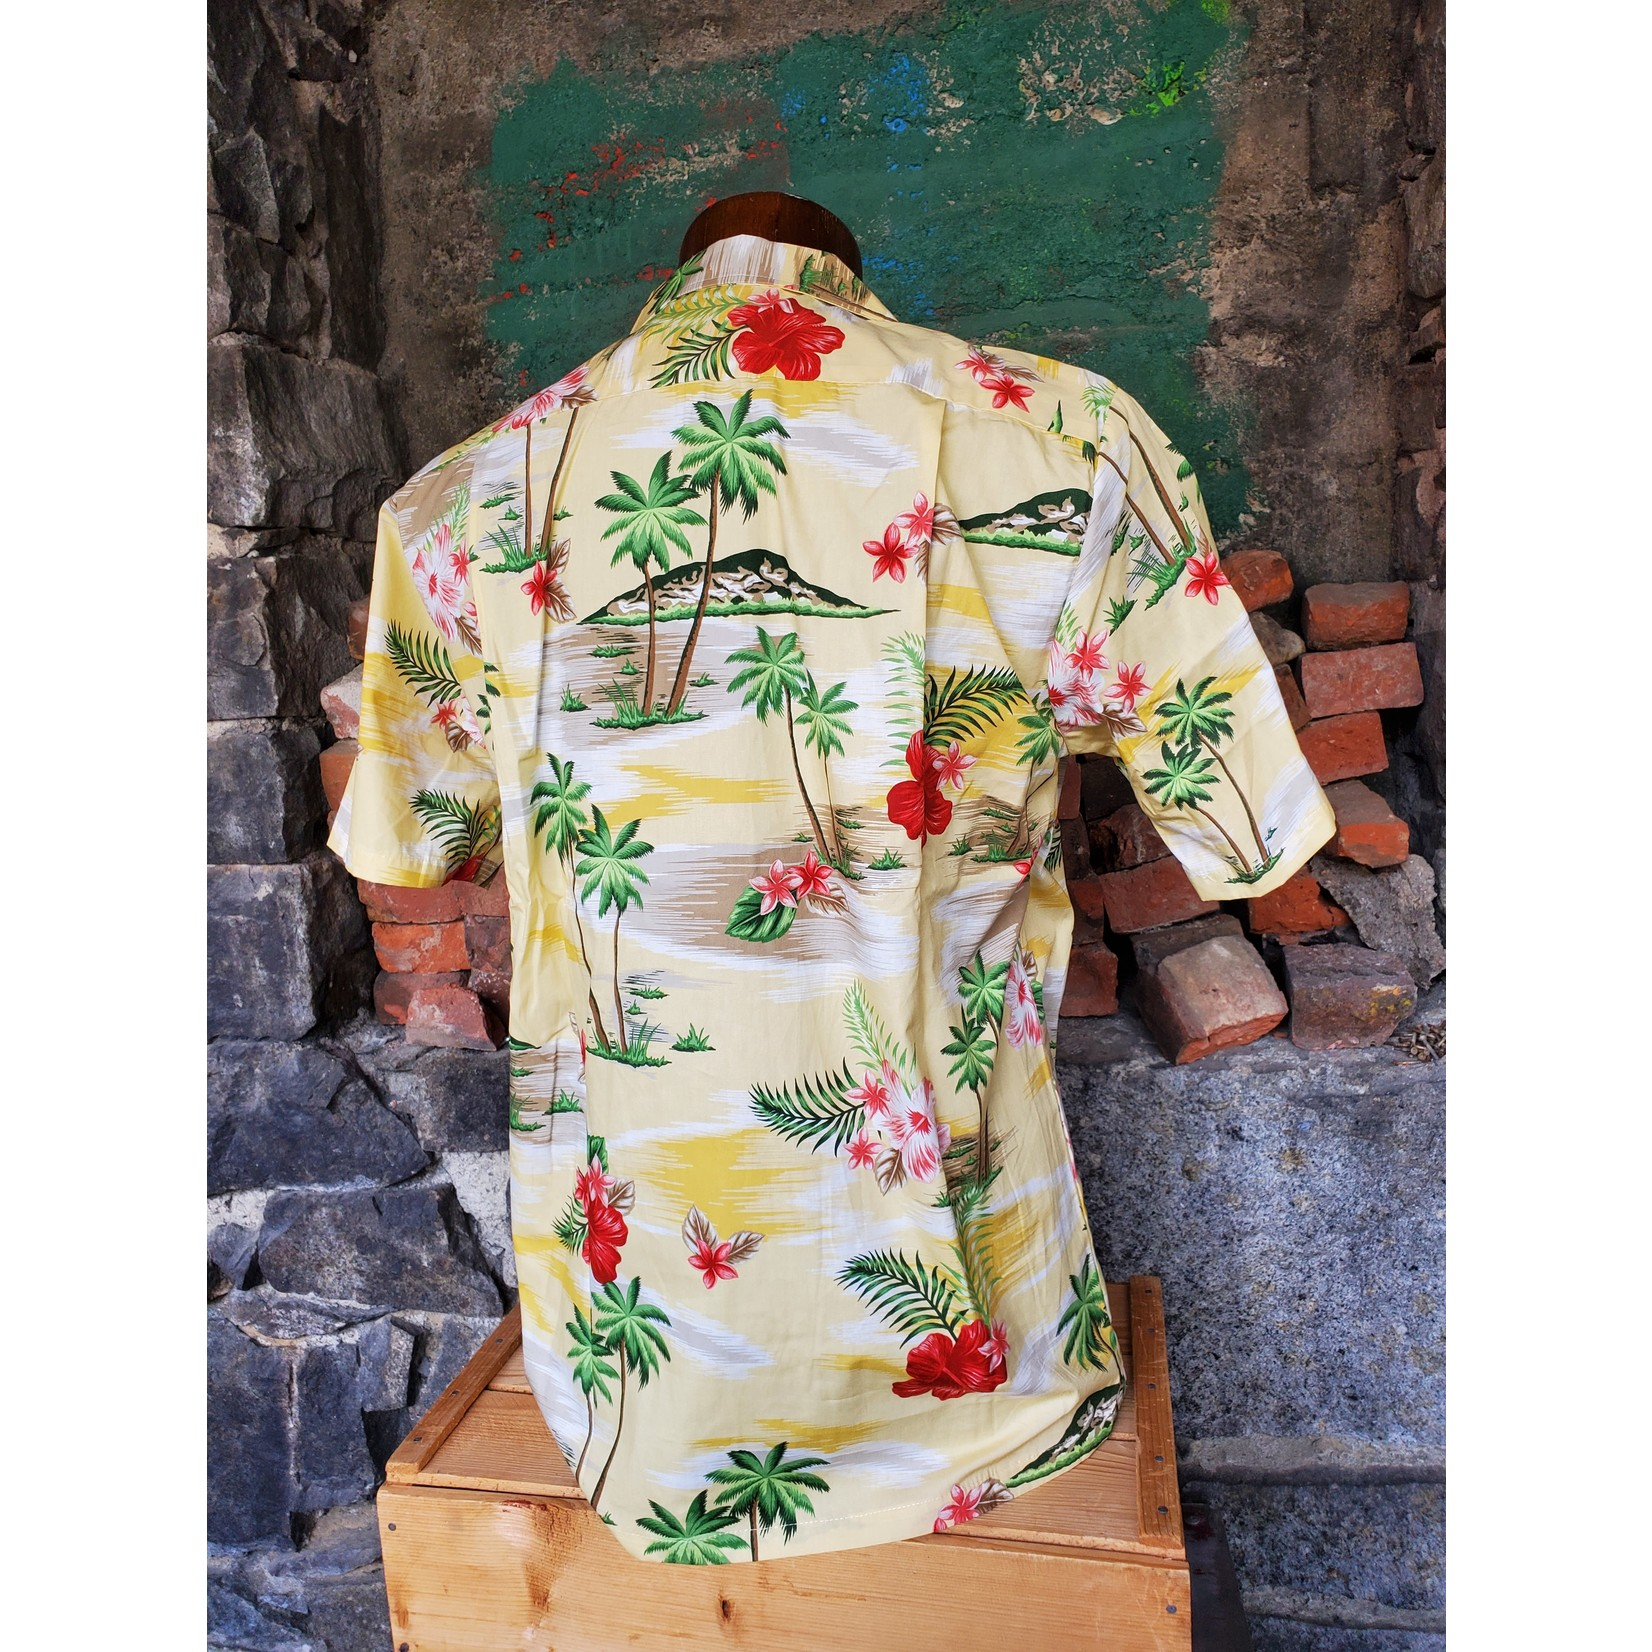 RJC Authentic Hawaiian Shirt - Yellow Palm Trees